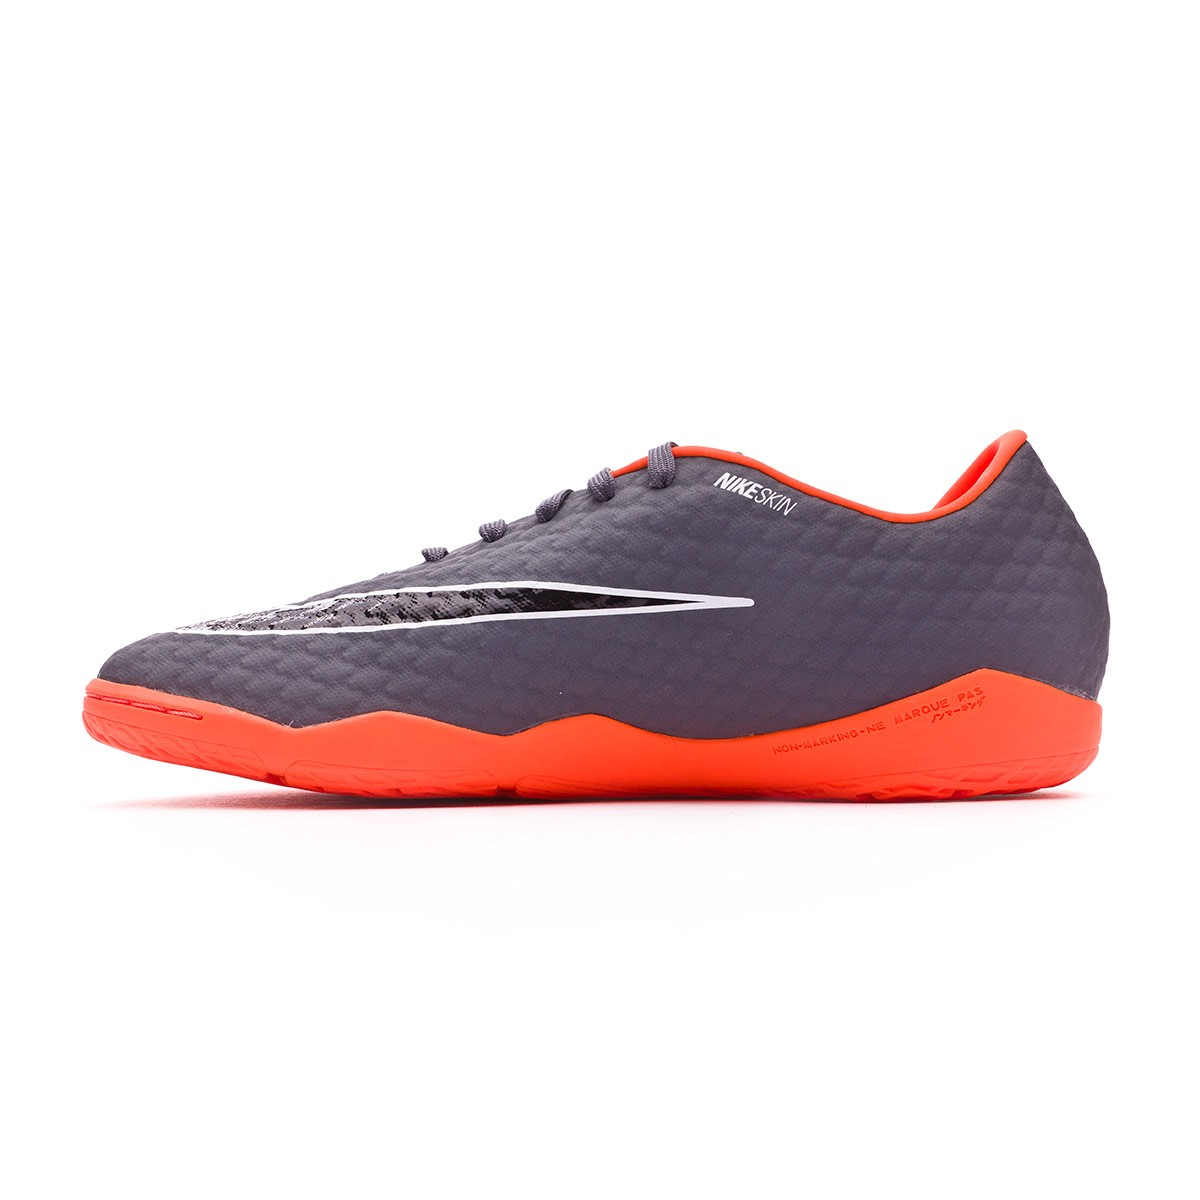 1b366e0ad124 Futsal Boot Nike Hypervenom PhantomX III Academy IC Dark grey-Total  orange-White - Football store Fútbol Emotion